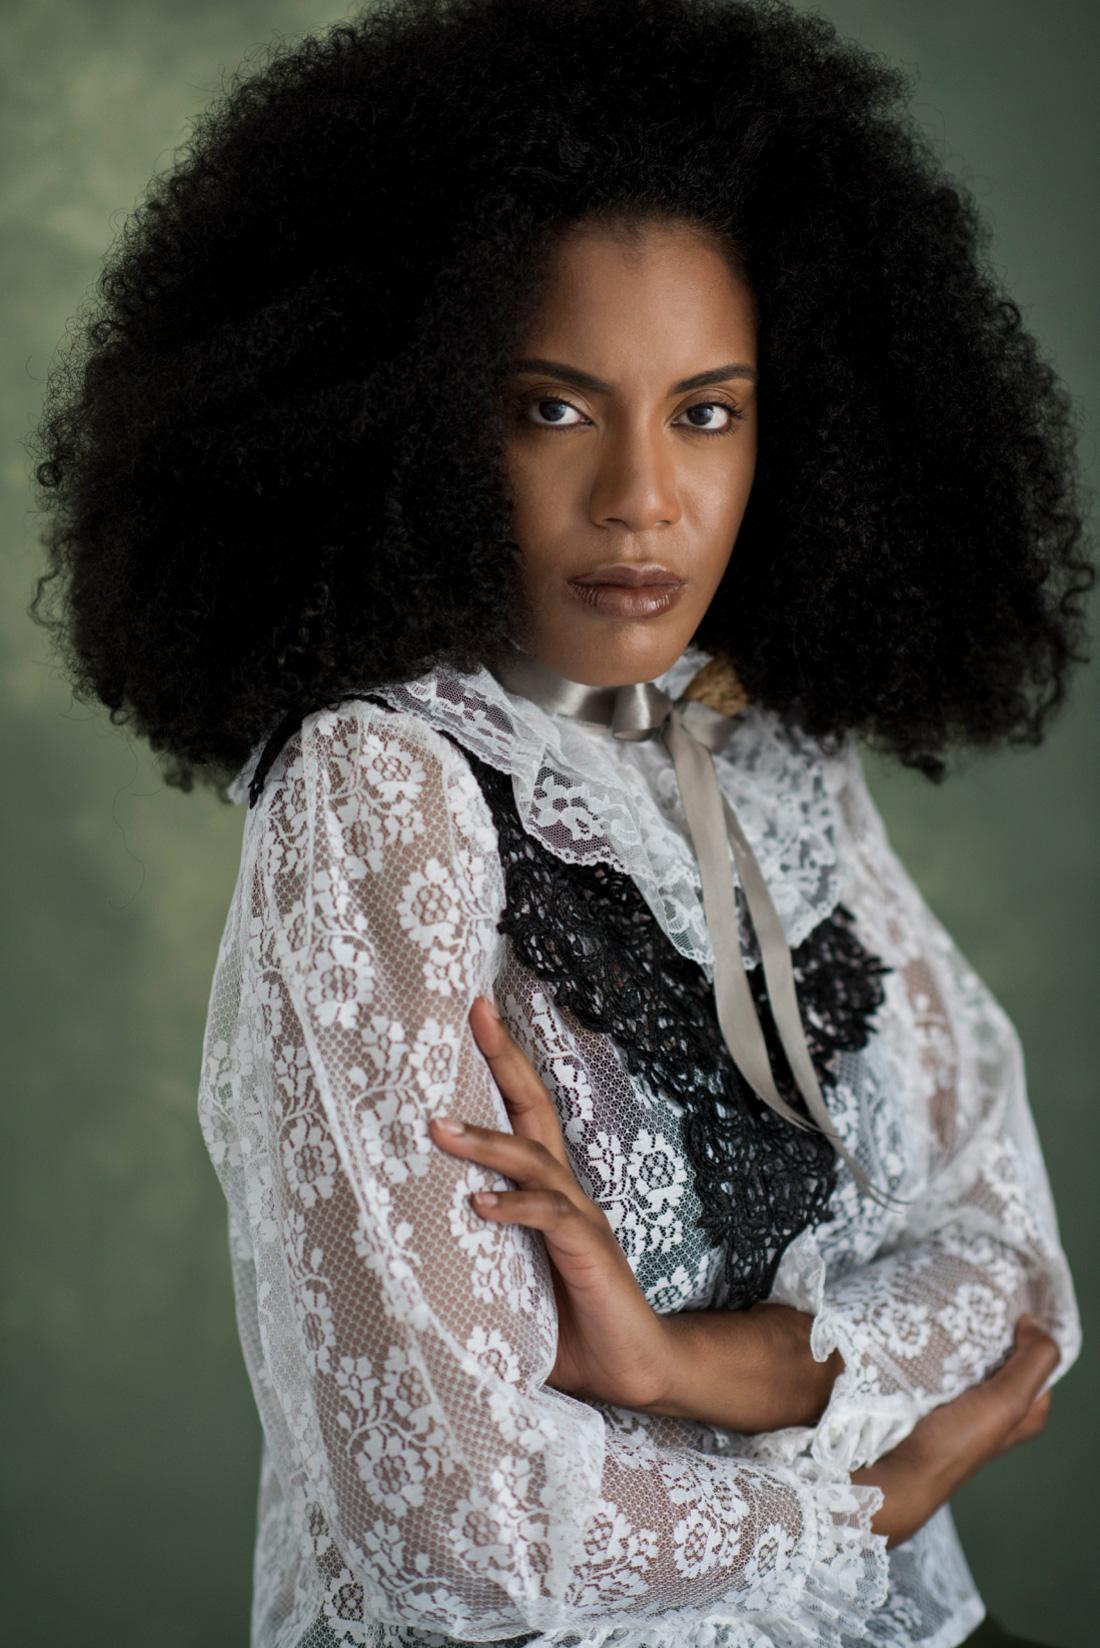 victorian-afro-krachtige-blik-enorm-kapsel